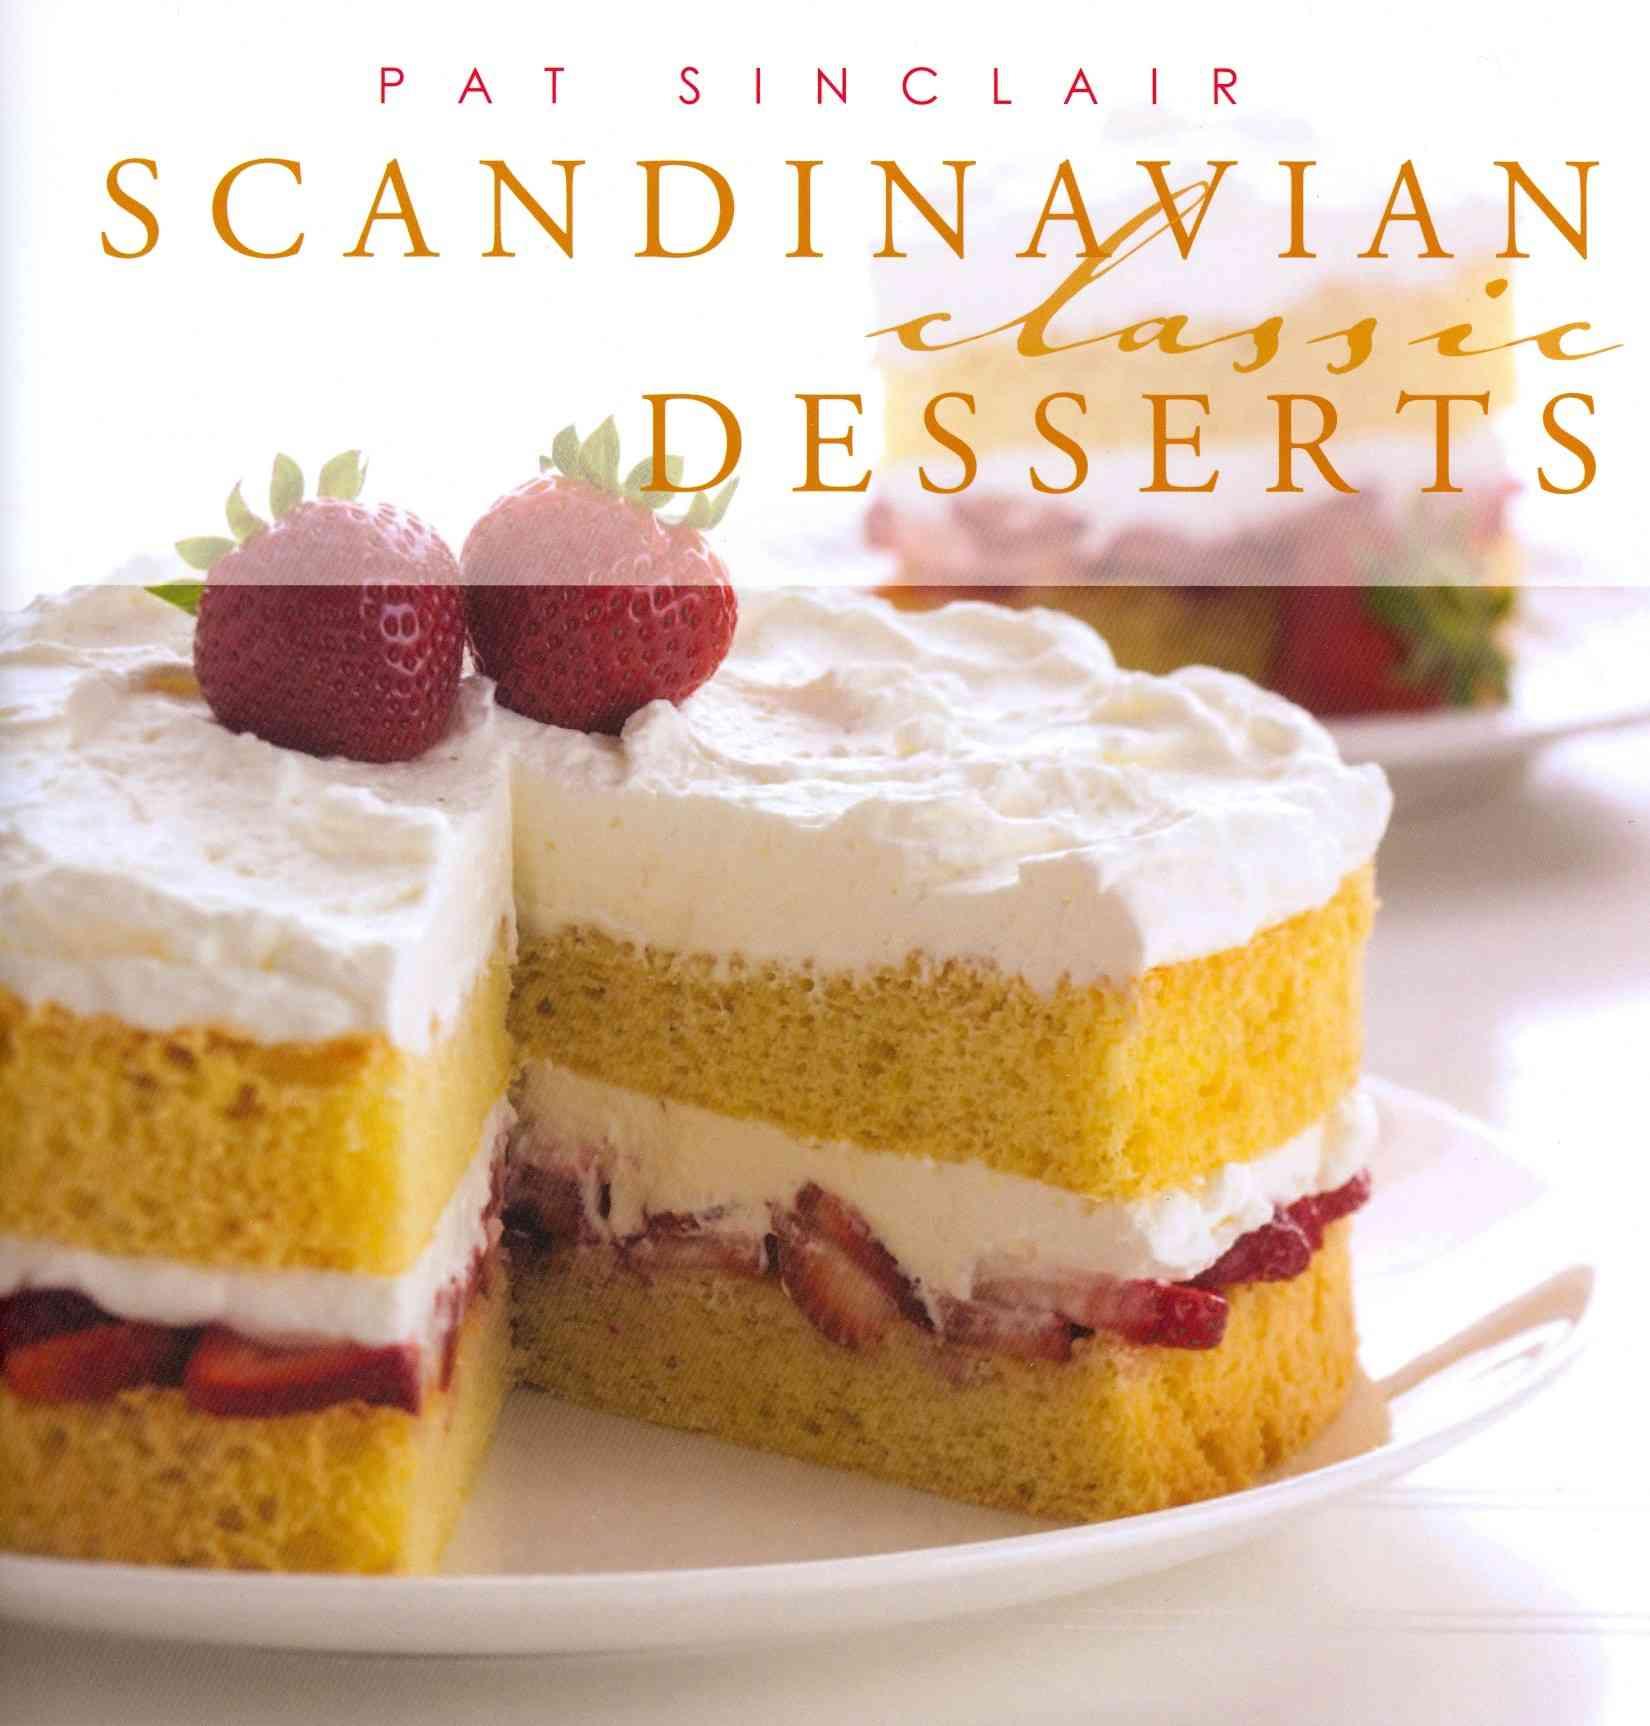 Scandinavian Classic Desserts By Sinclair, Pat/ Butkowski, Joel (PHT)